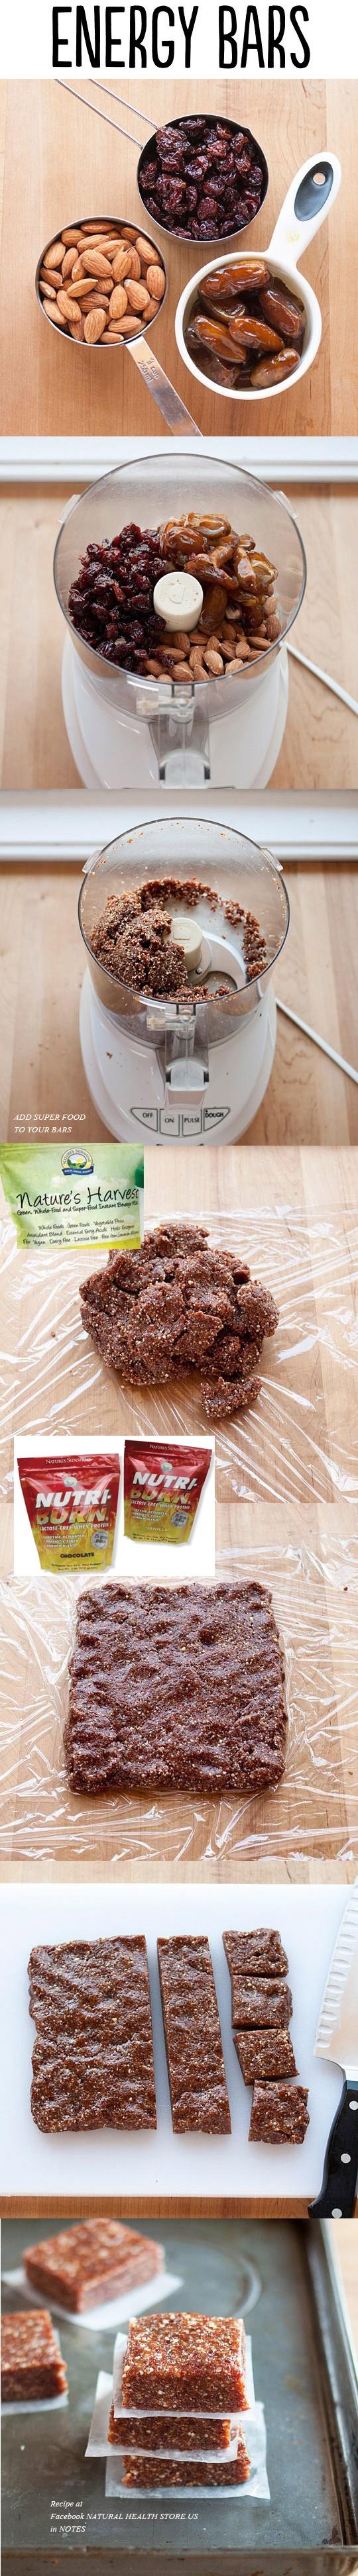 ENERGY BARS with Super Foods https://www.facebook.com/NaturalHealthStore.US /#Natural#Sunshine#Favorite#Alternative#Medicine#Health#Beauty#New#food